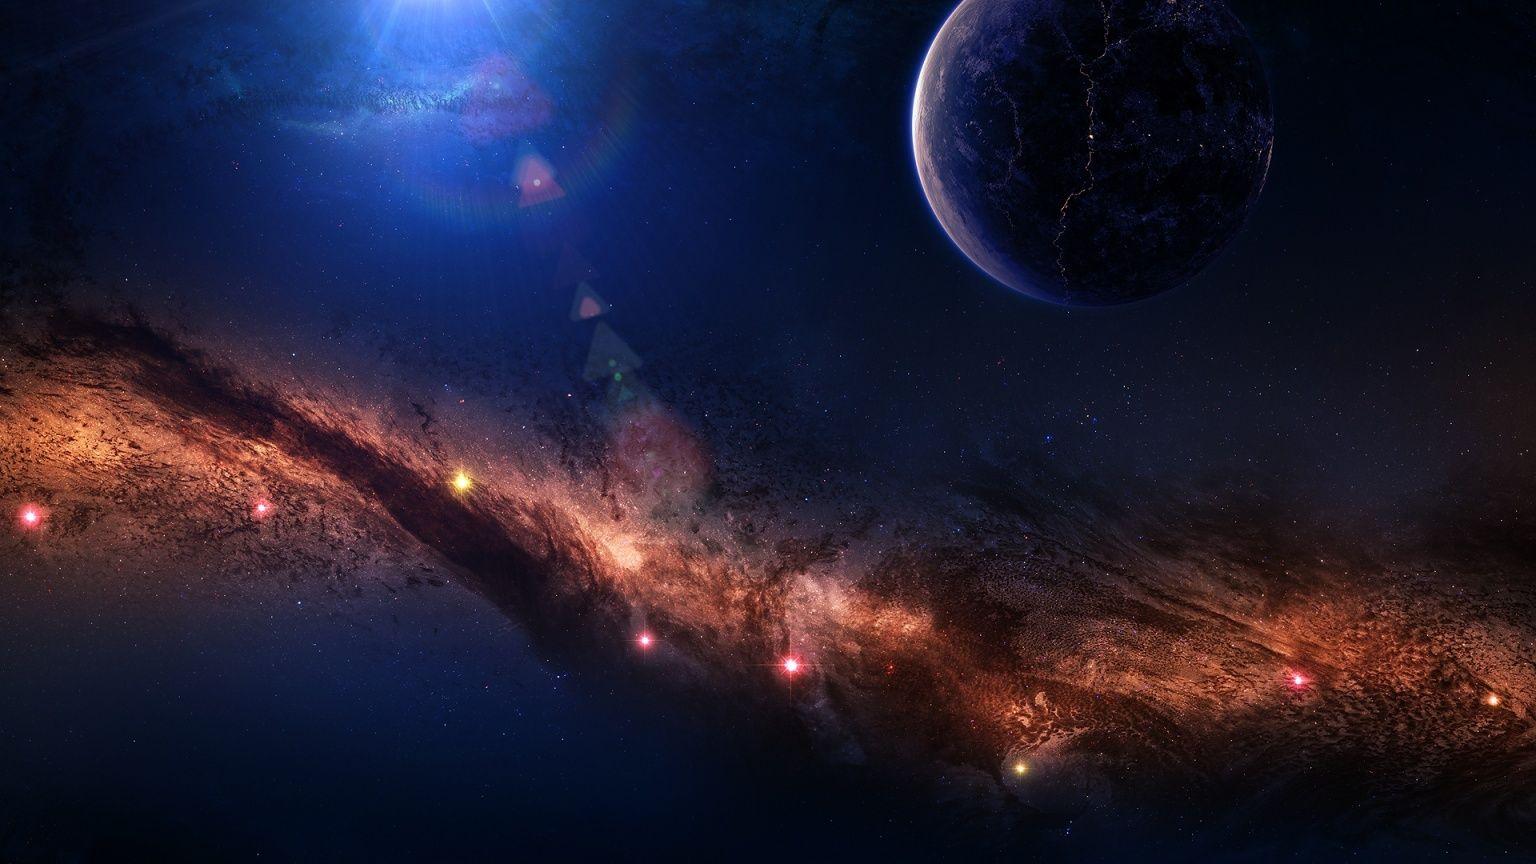 Batman Vs Superman Awesome Logo X Hdtv Wallpaper Nebula Wallpaper Planets Images Space Art